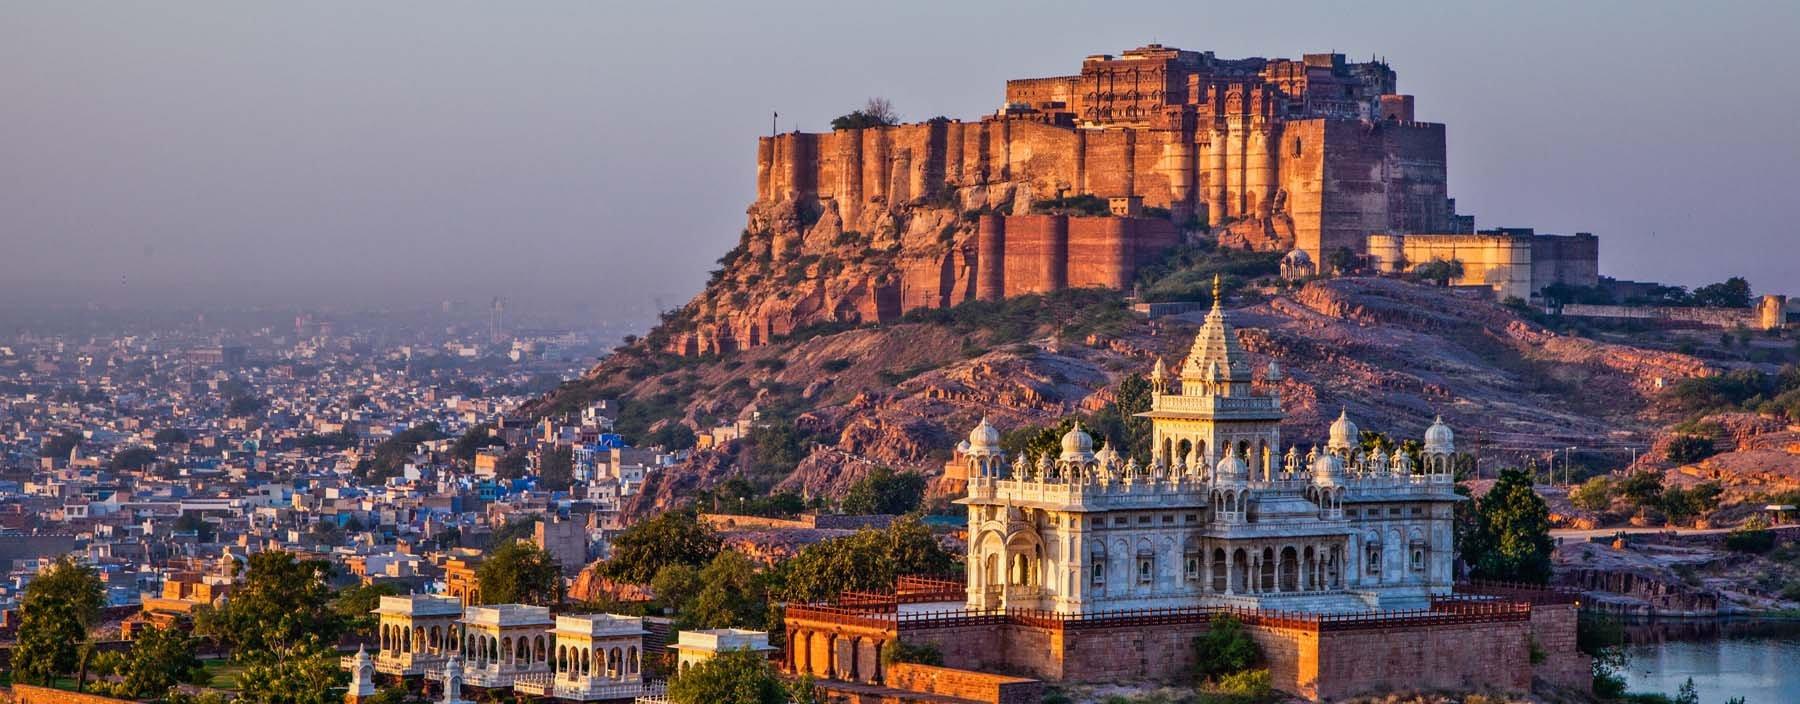 in, jodhpur, mehrangarh fort and jaswant thada mausoleum.jpg